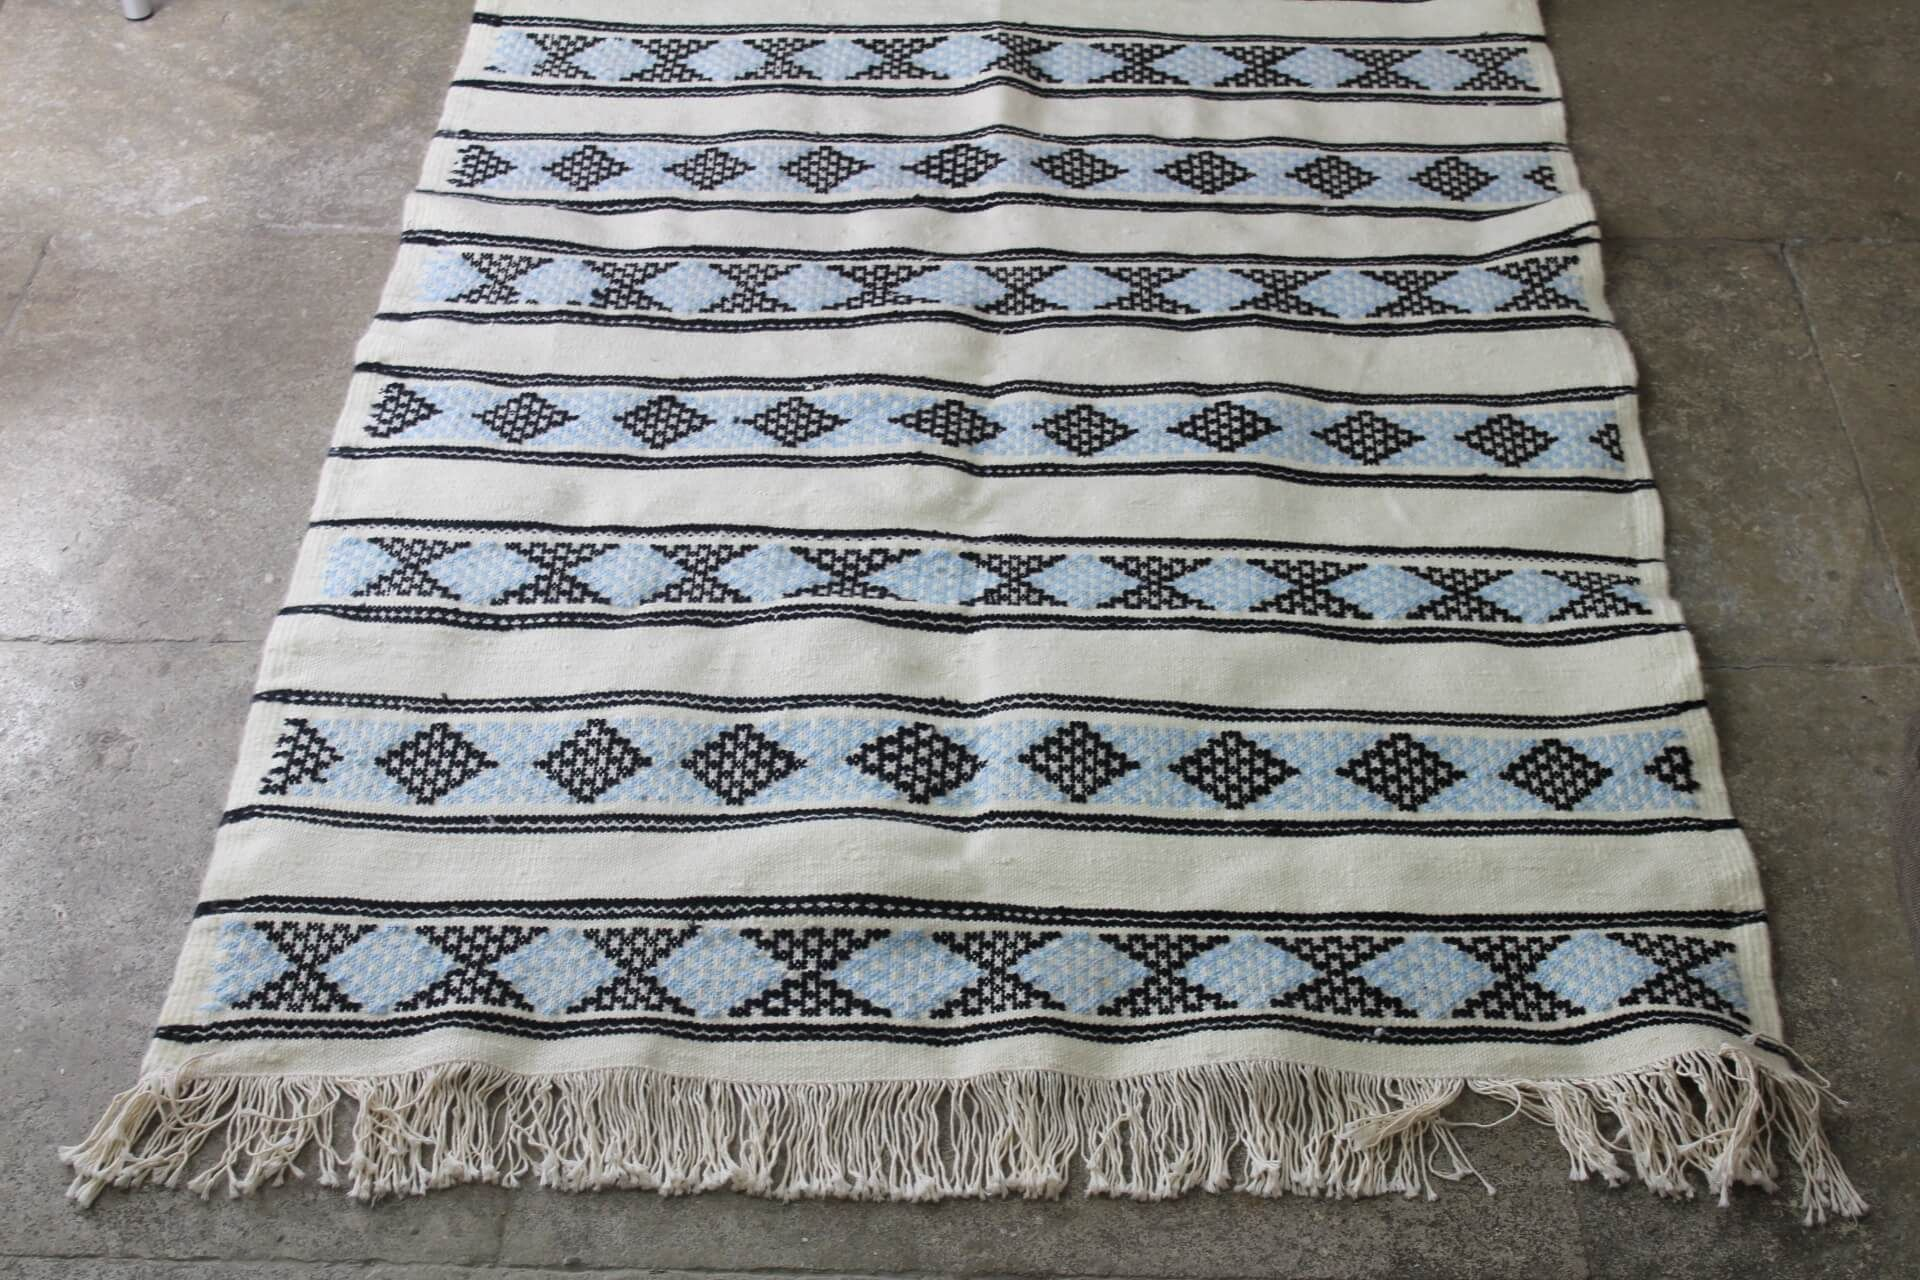 magnifique tapis berbere atlas tiss la main par des. Black Bedroom Furniture Sets. Home Design Ideas